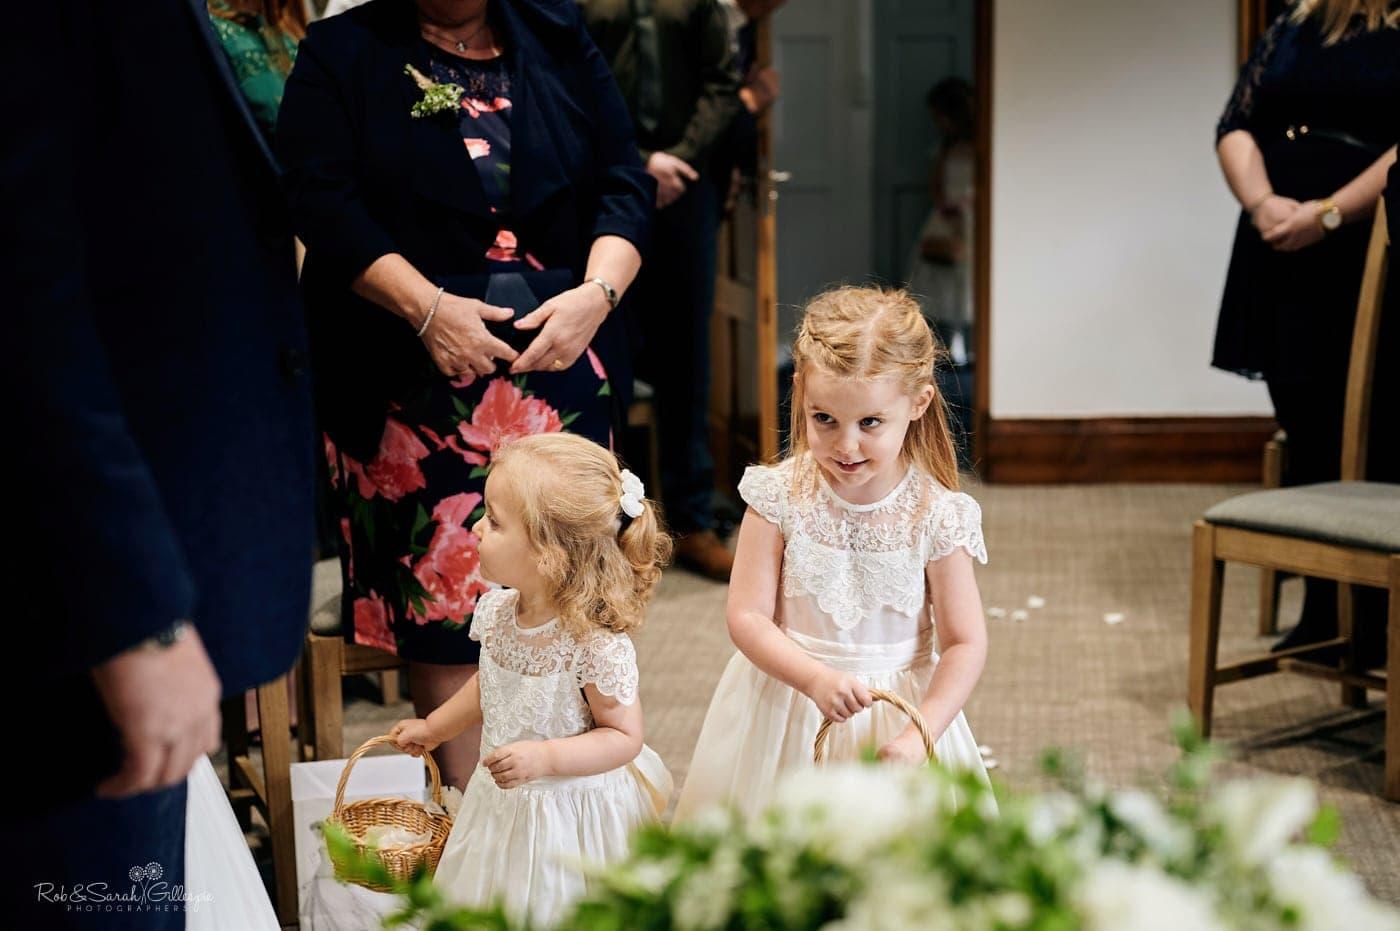 Flowergirls enter wedding ceremony at The Henley Room in Stratford-upon-Avon